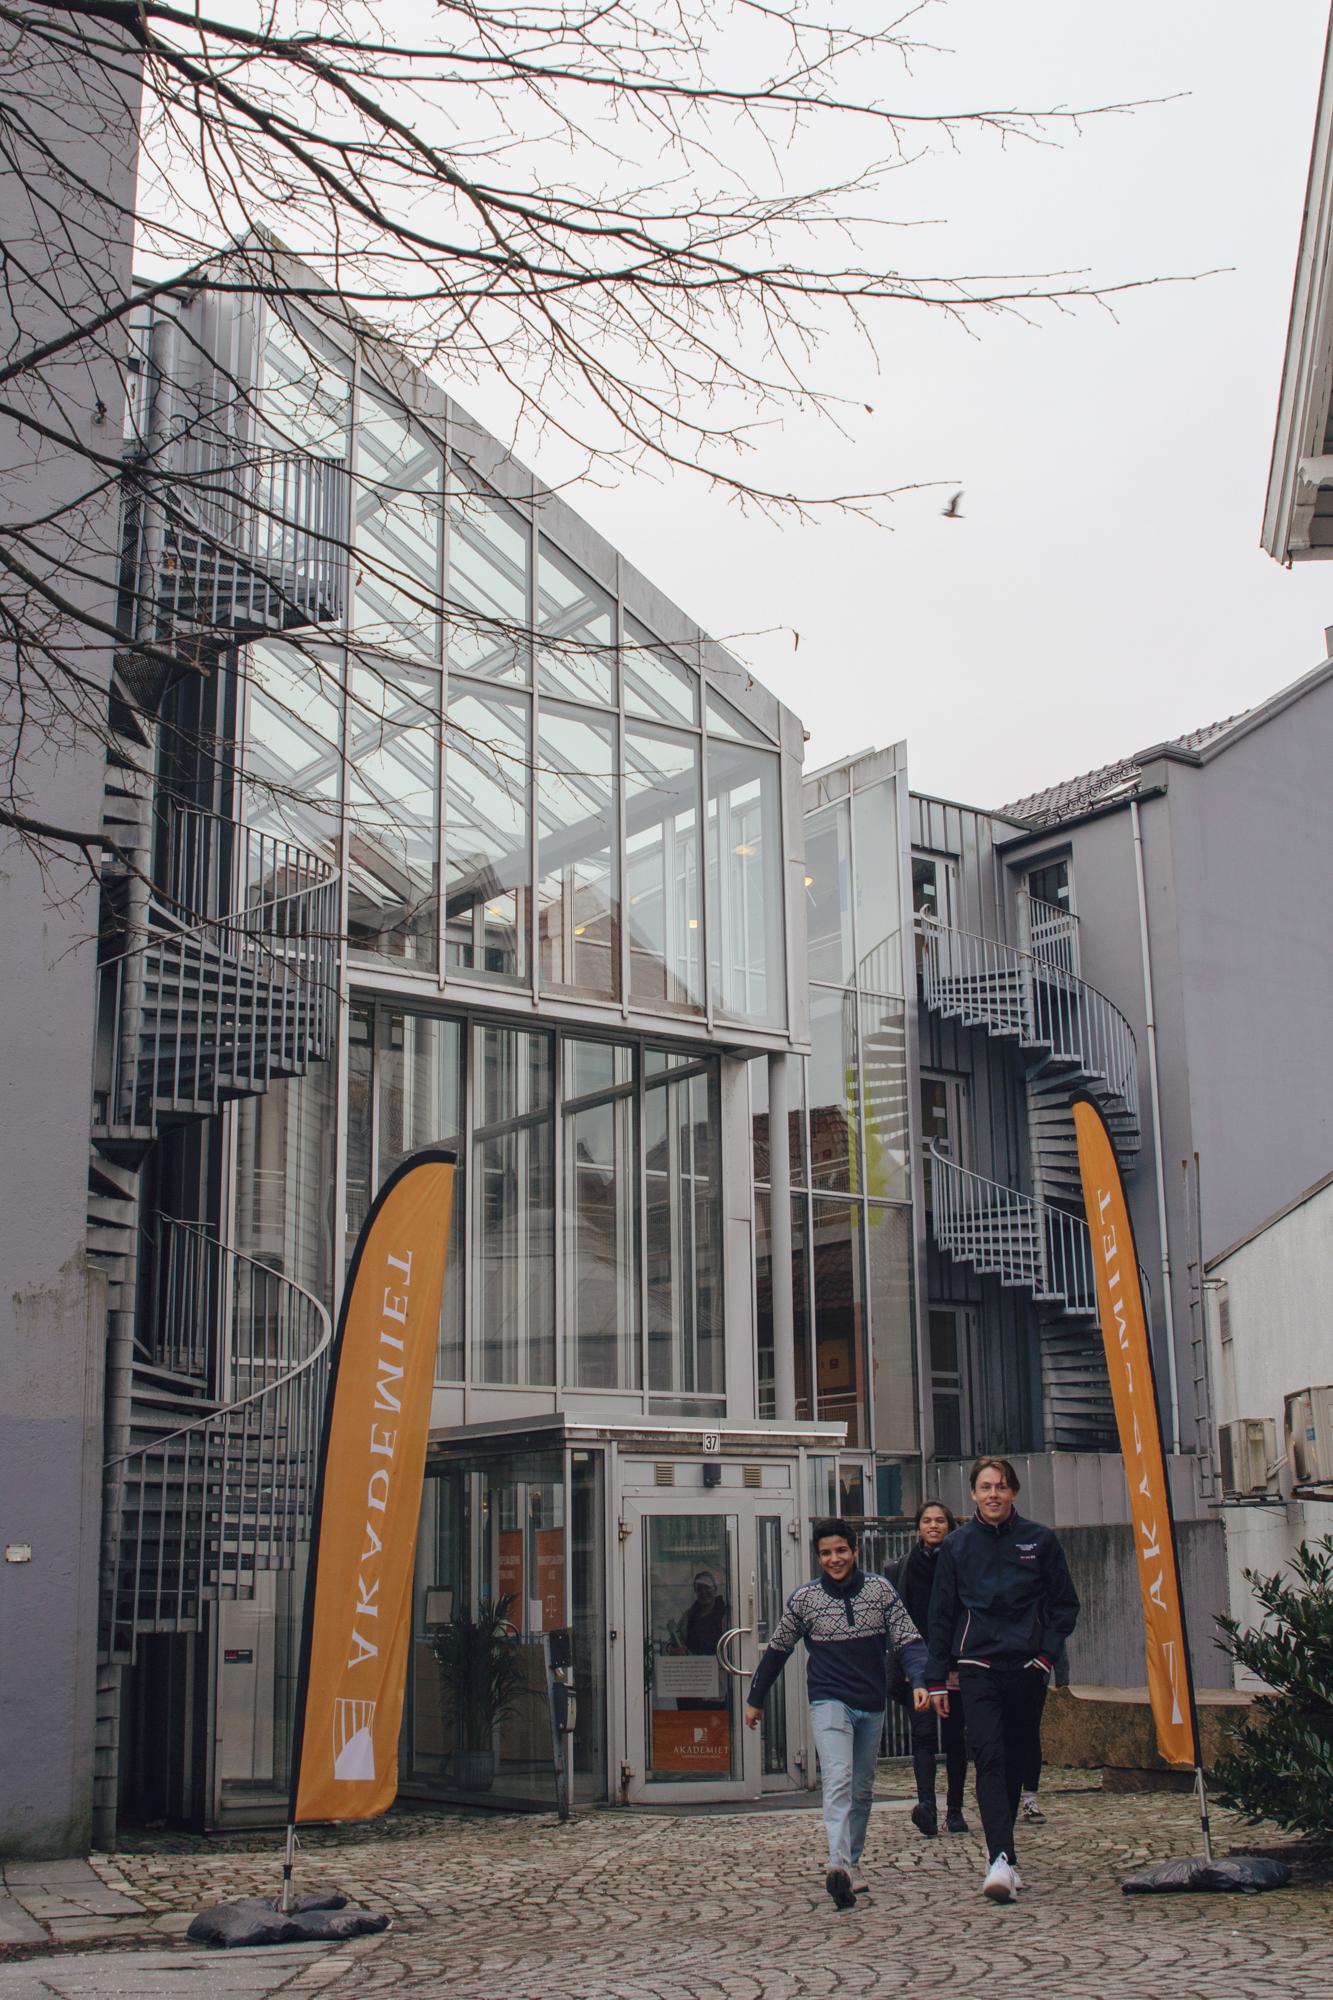 Elever utenfor inngangen til Akademiet VGS Bergen. Foto.